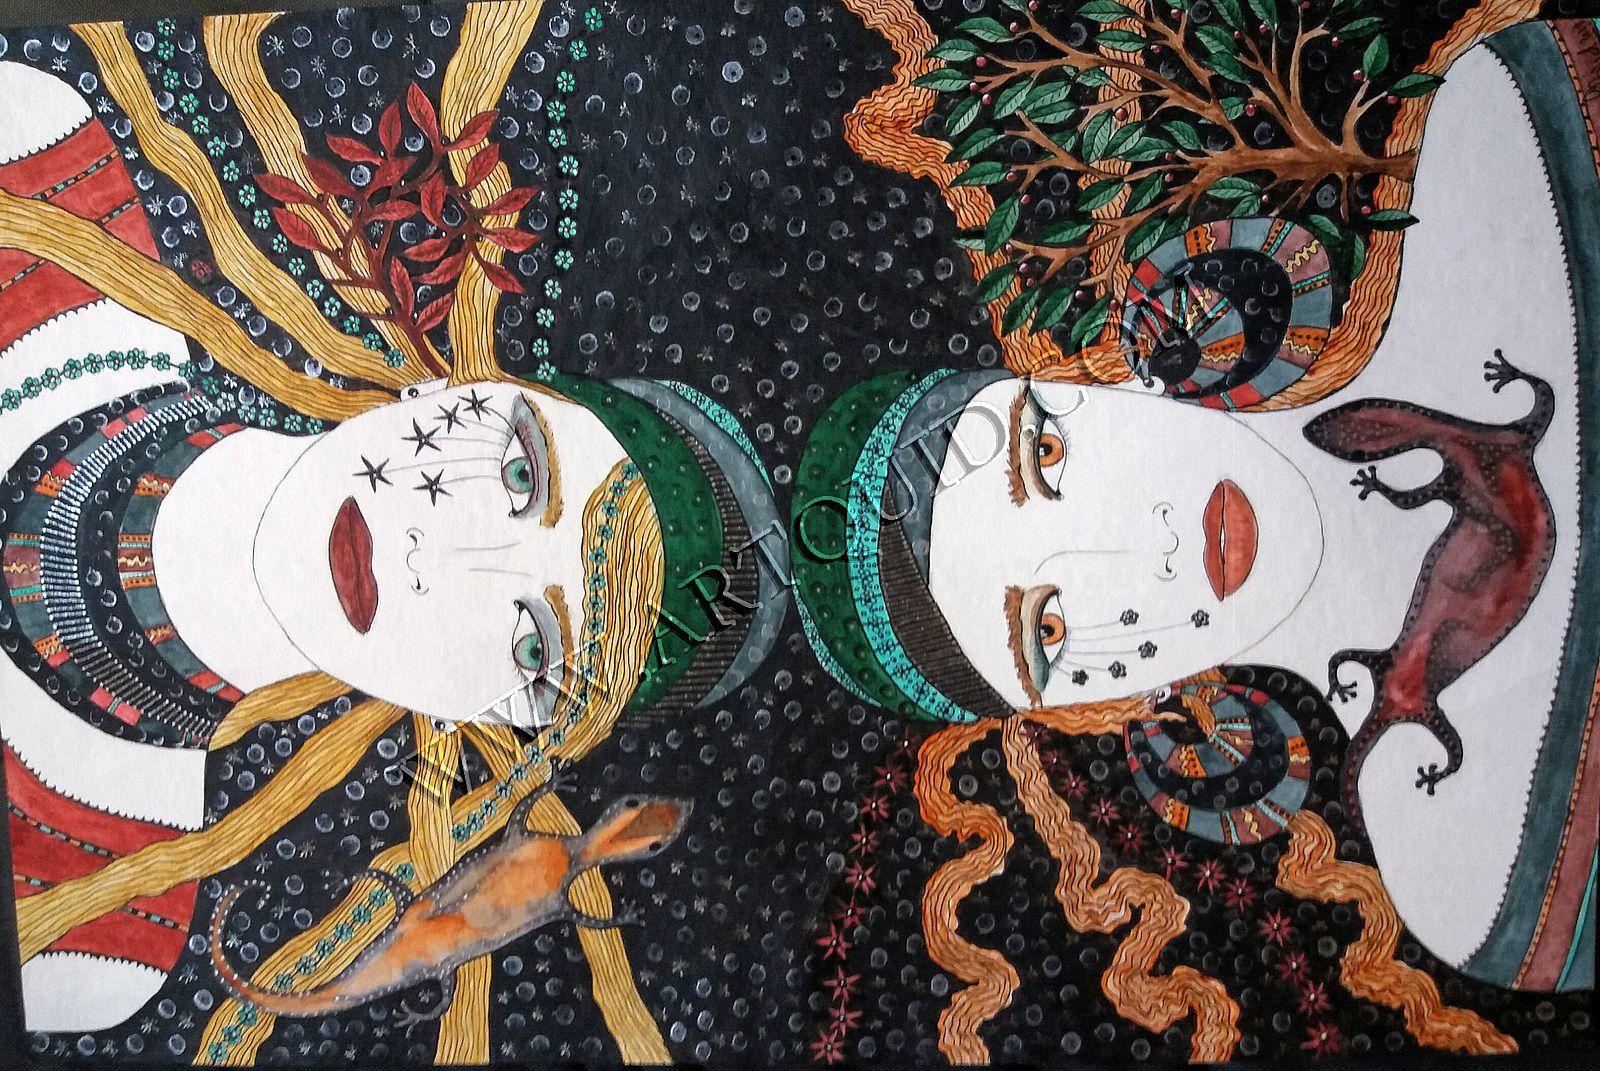 head in the stars - -- aquarelle ---- sophie bigard ---- artiste